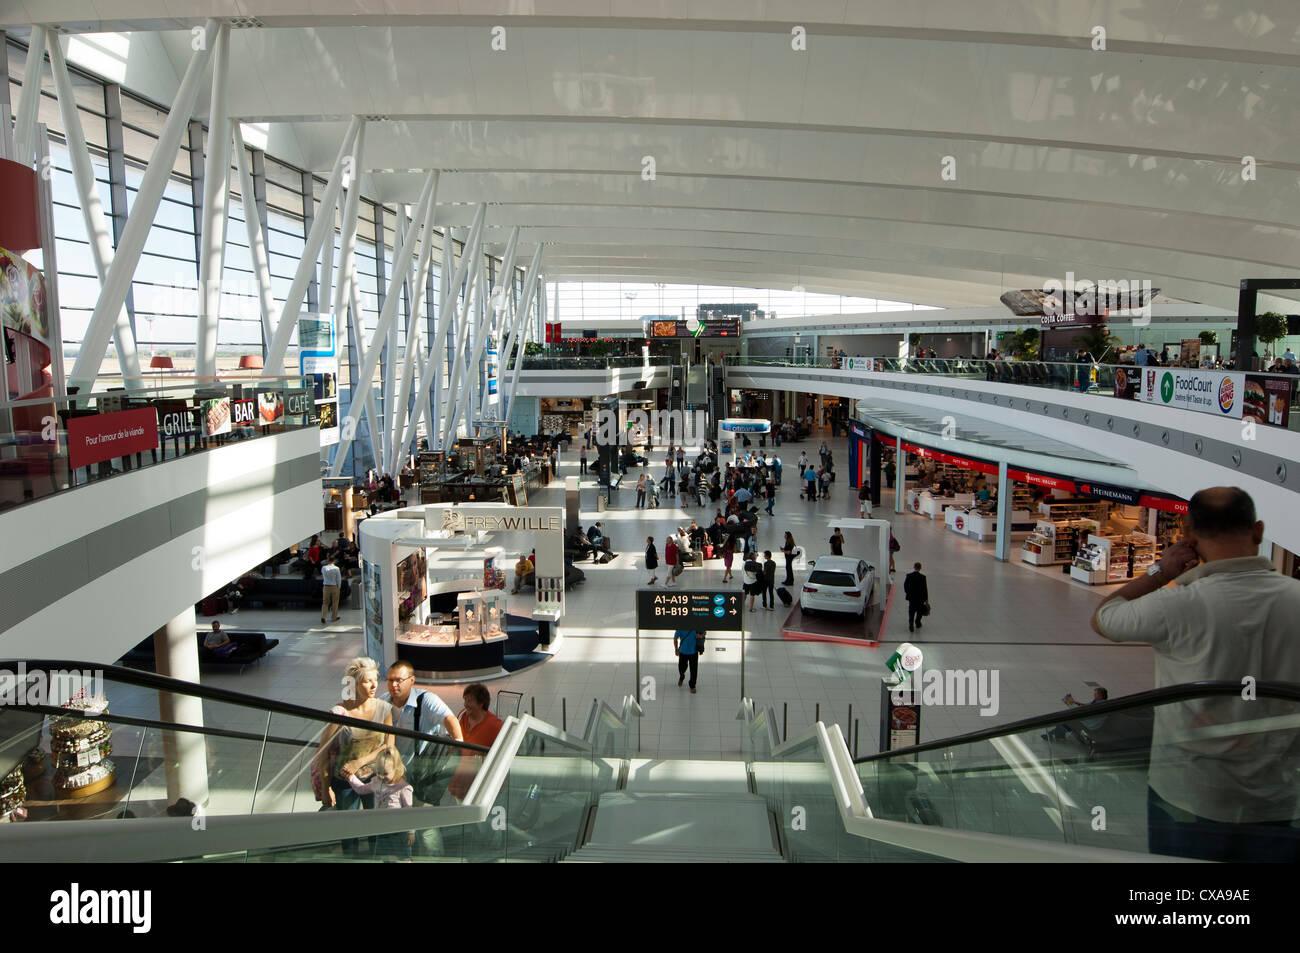 Aeroporto Budapest : Budapest airport stock photo alamy